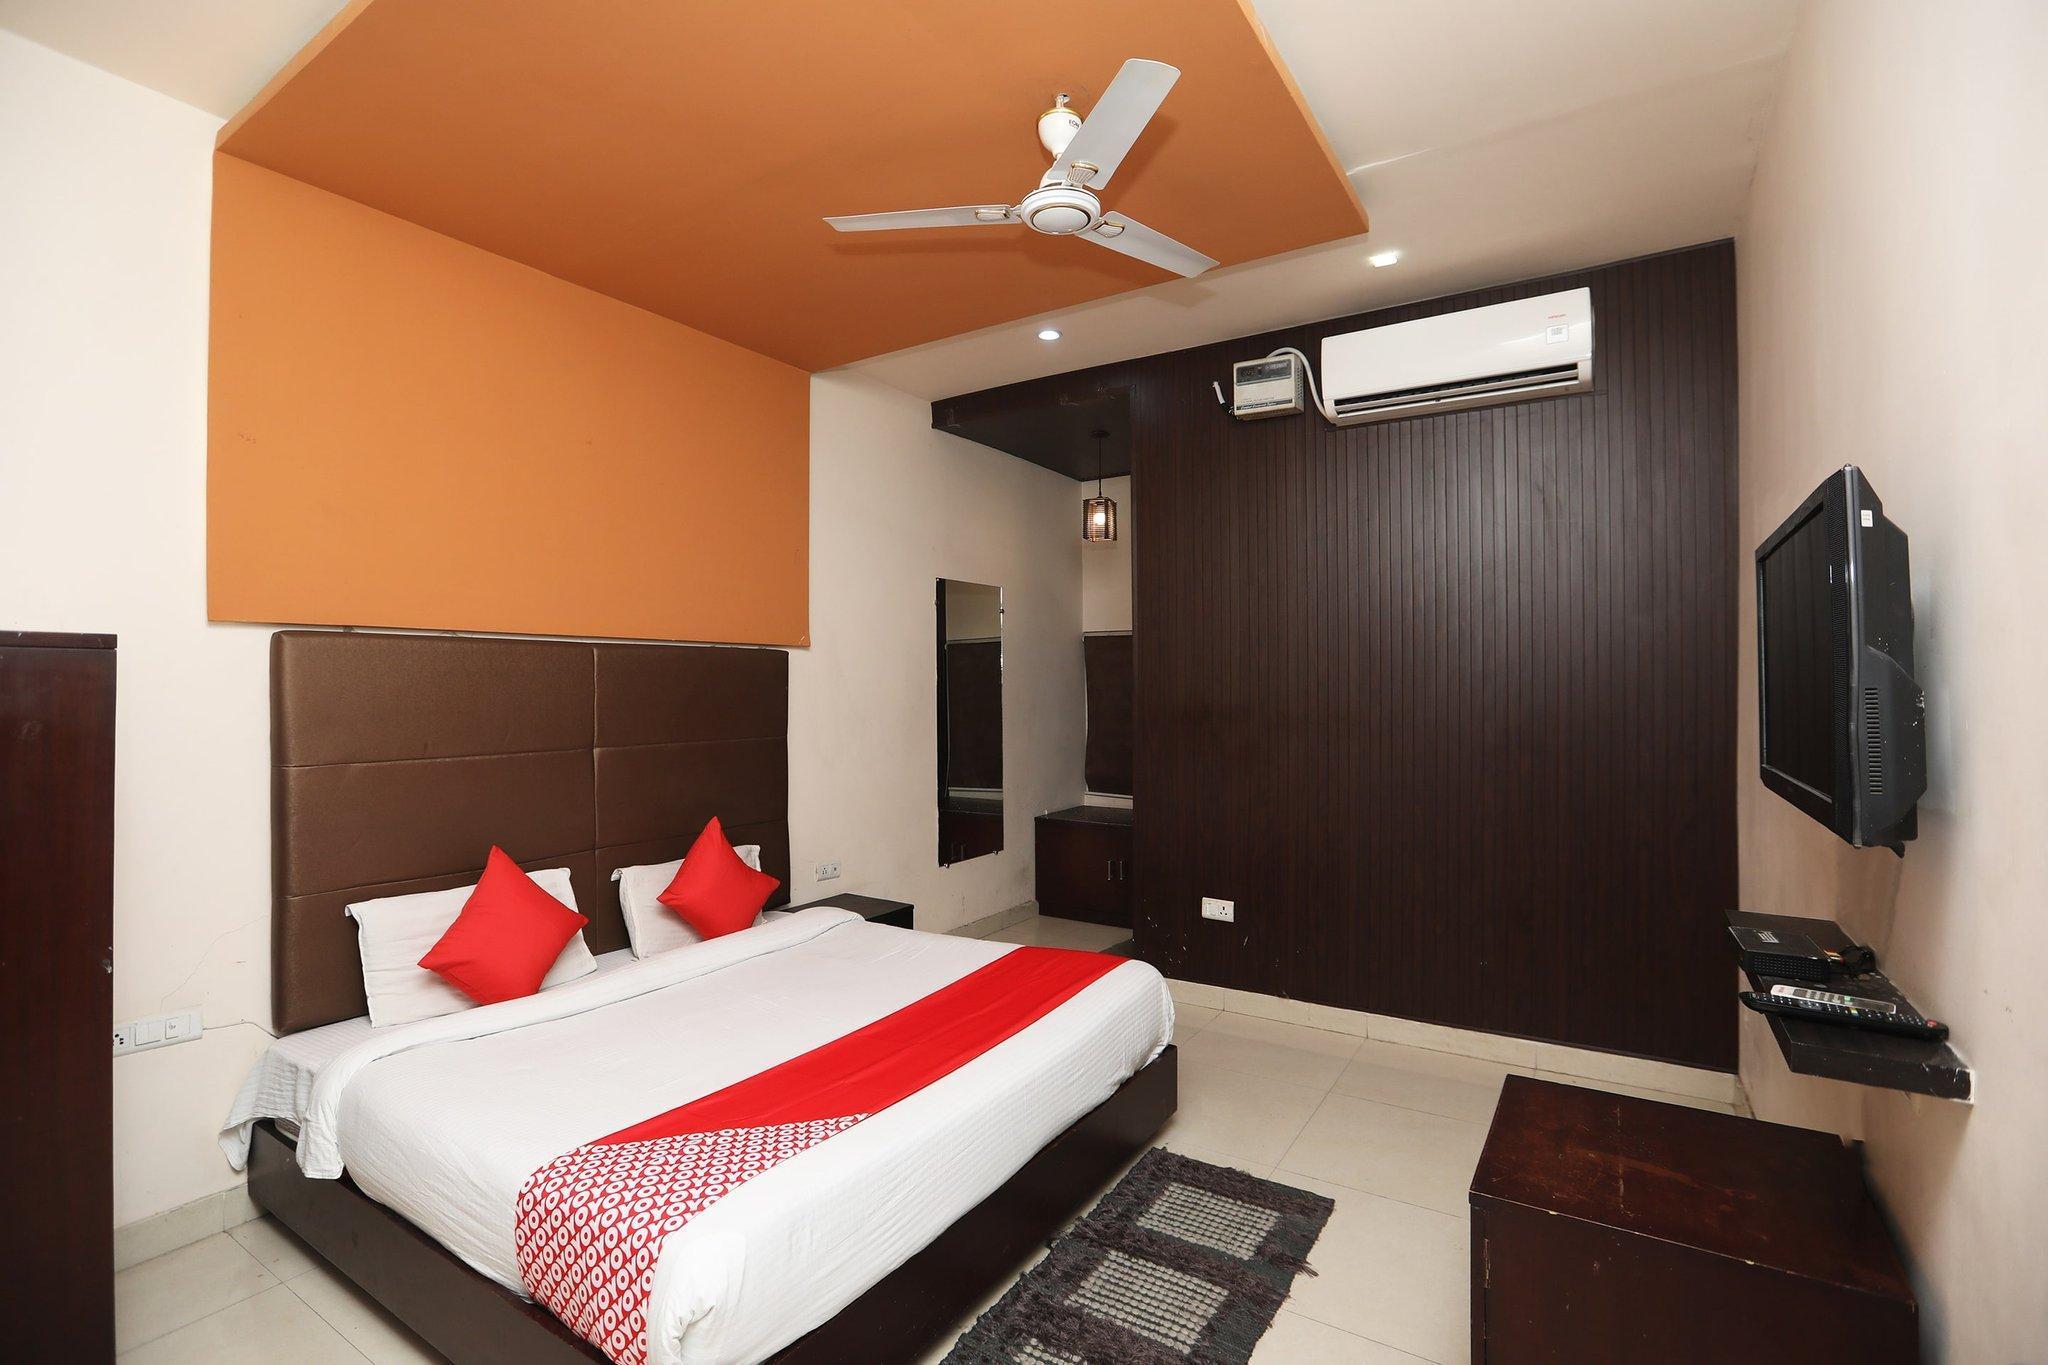 OYO 40255 Lal Quila Airport Resort, Meerut